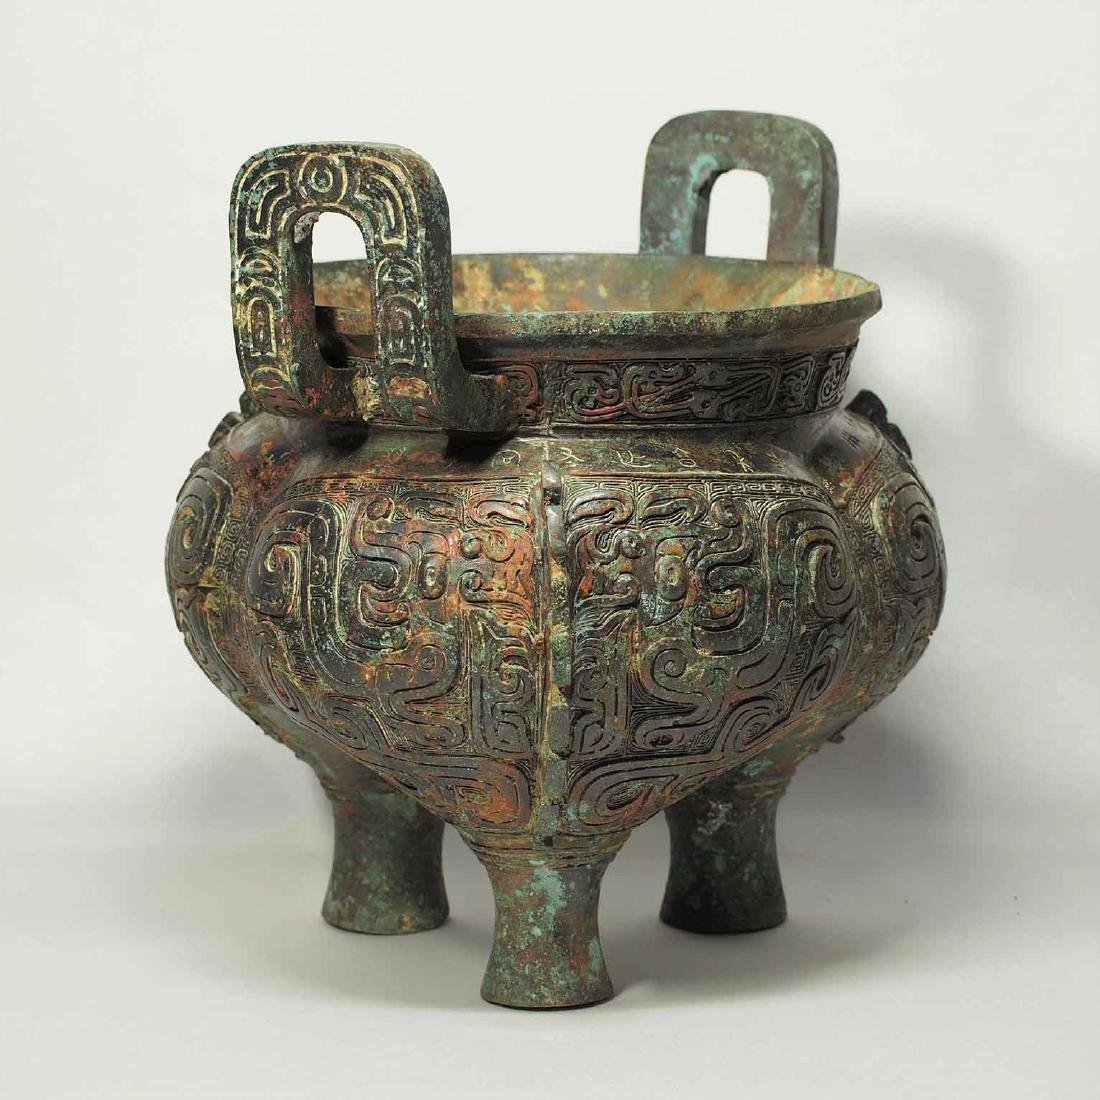 Li Ding' with Inscription and Dragon Design, Shang